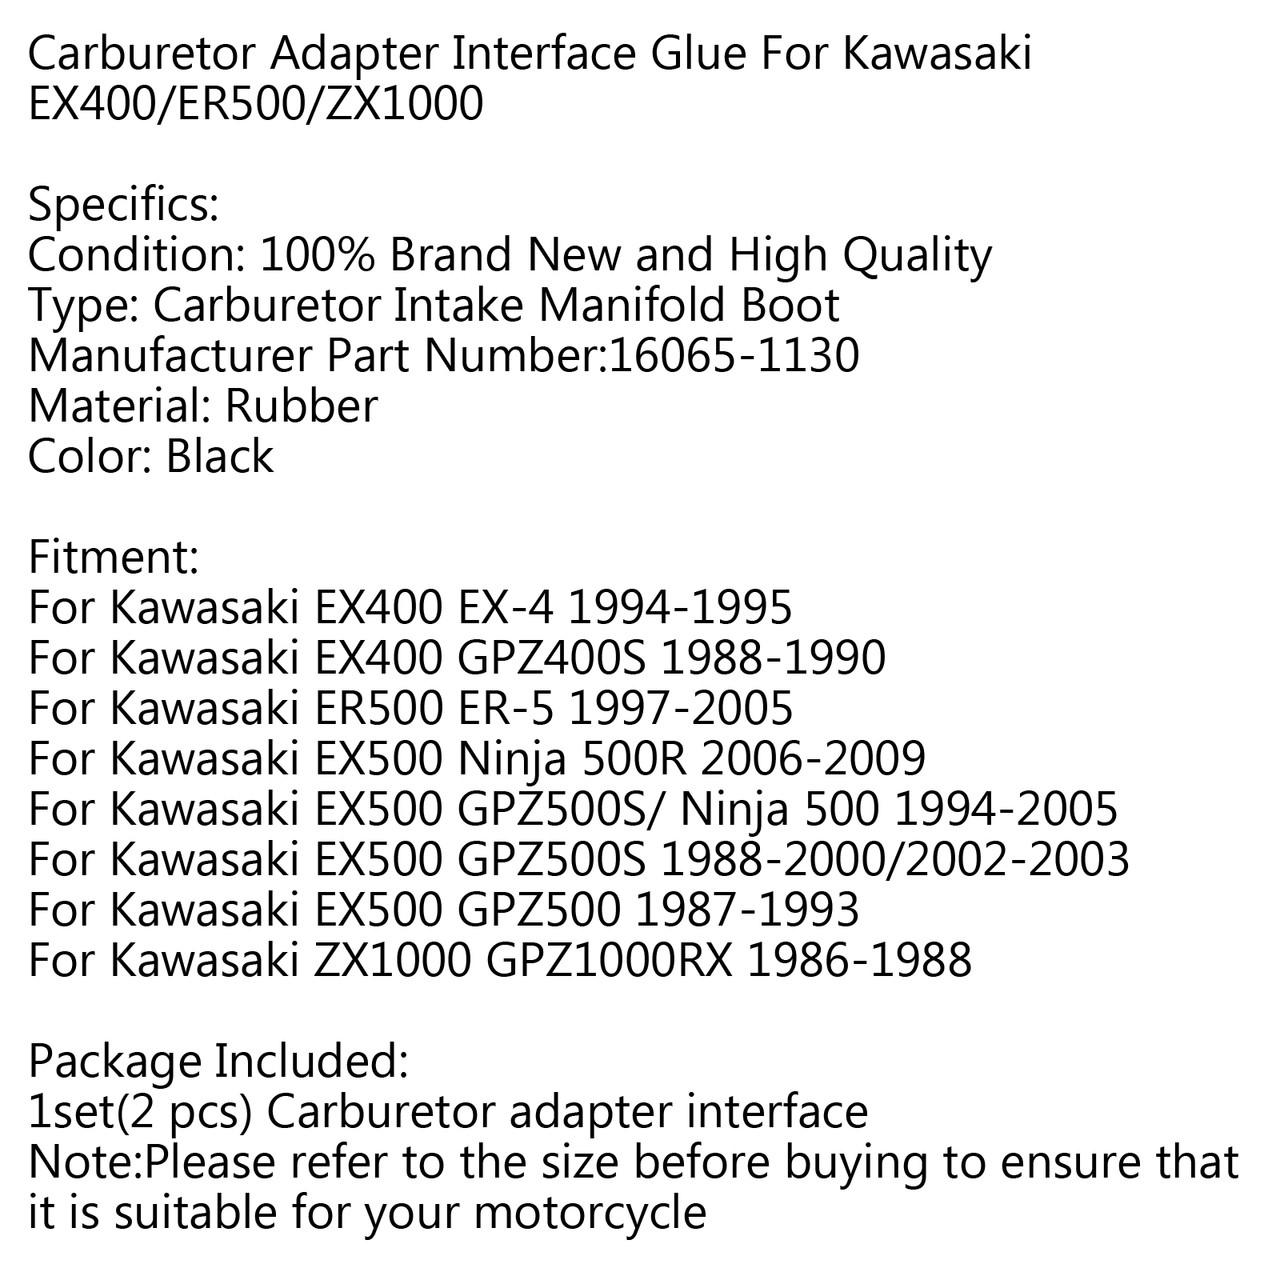 Carburetor Holder Intake Manifold Boot For Kawasaki ZX1000 GPZ1000RX 86-88